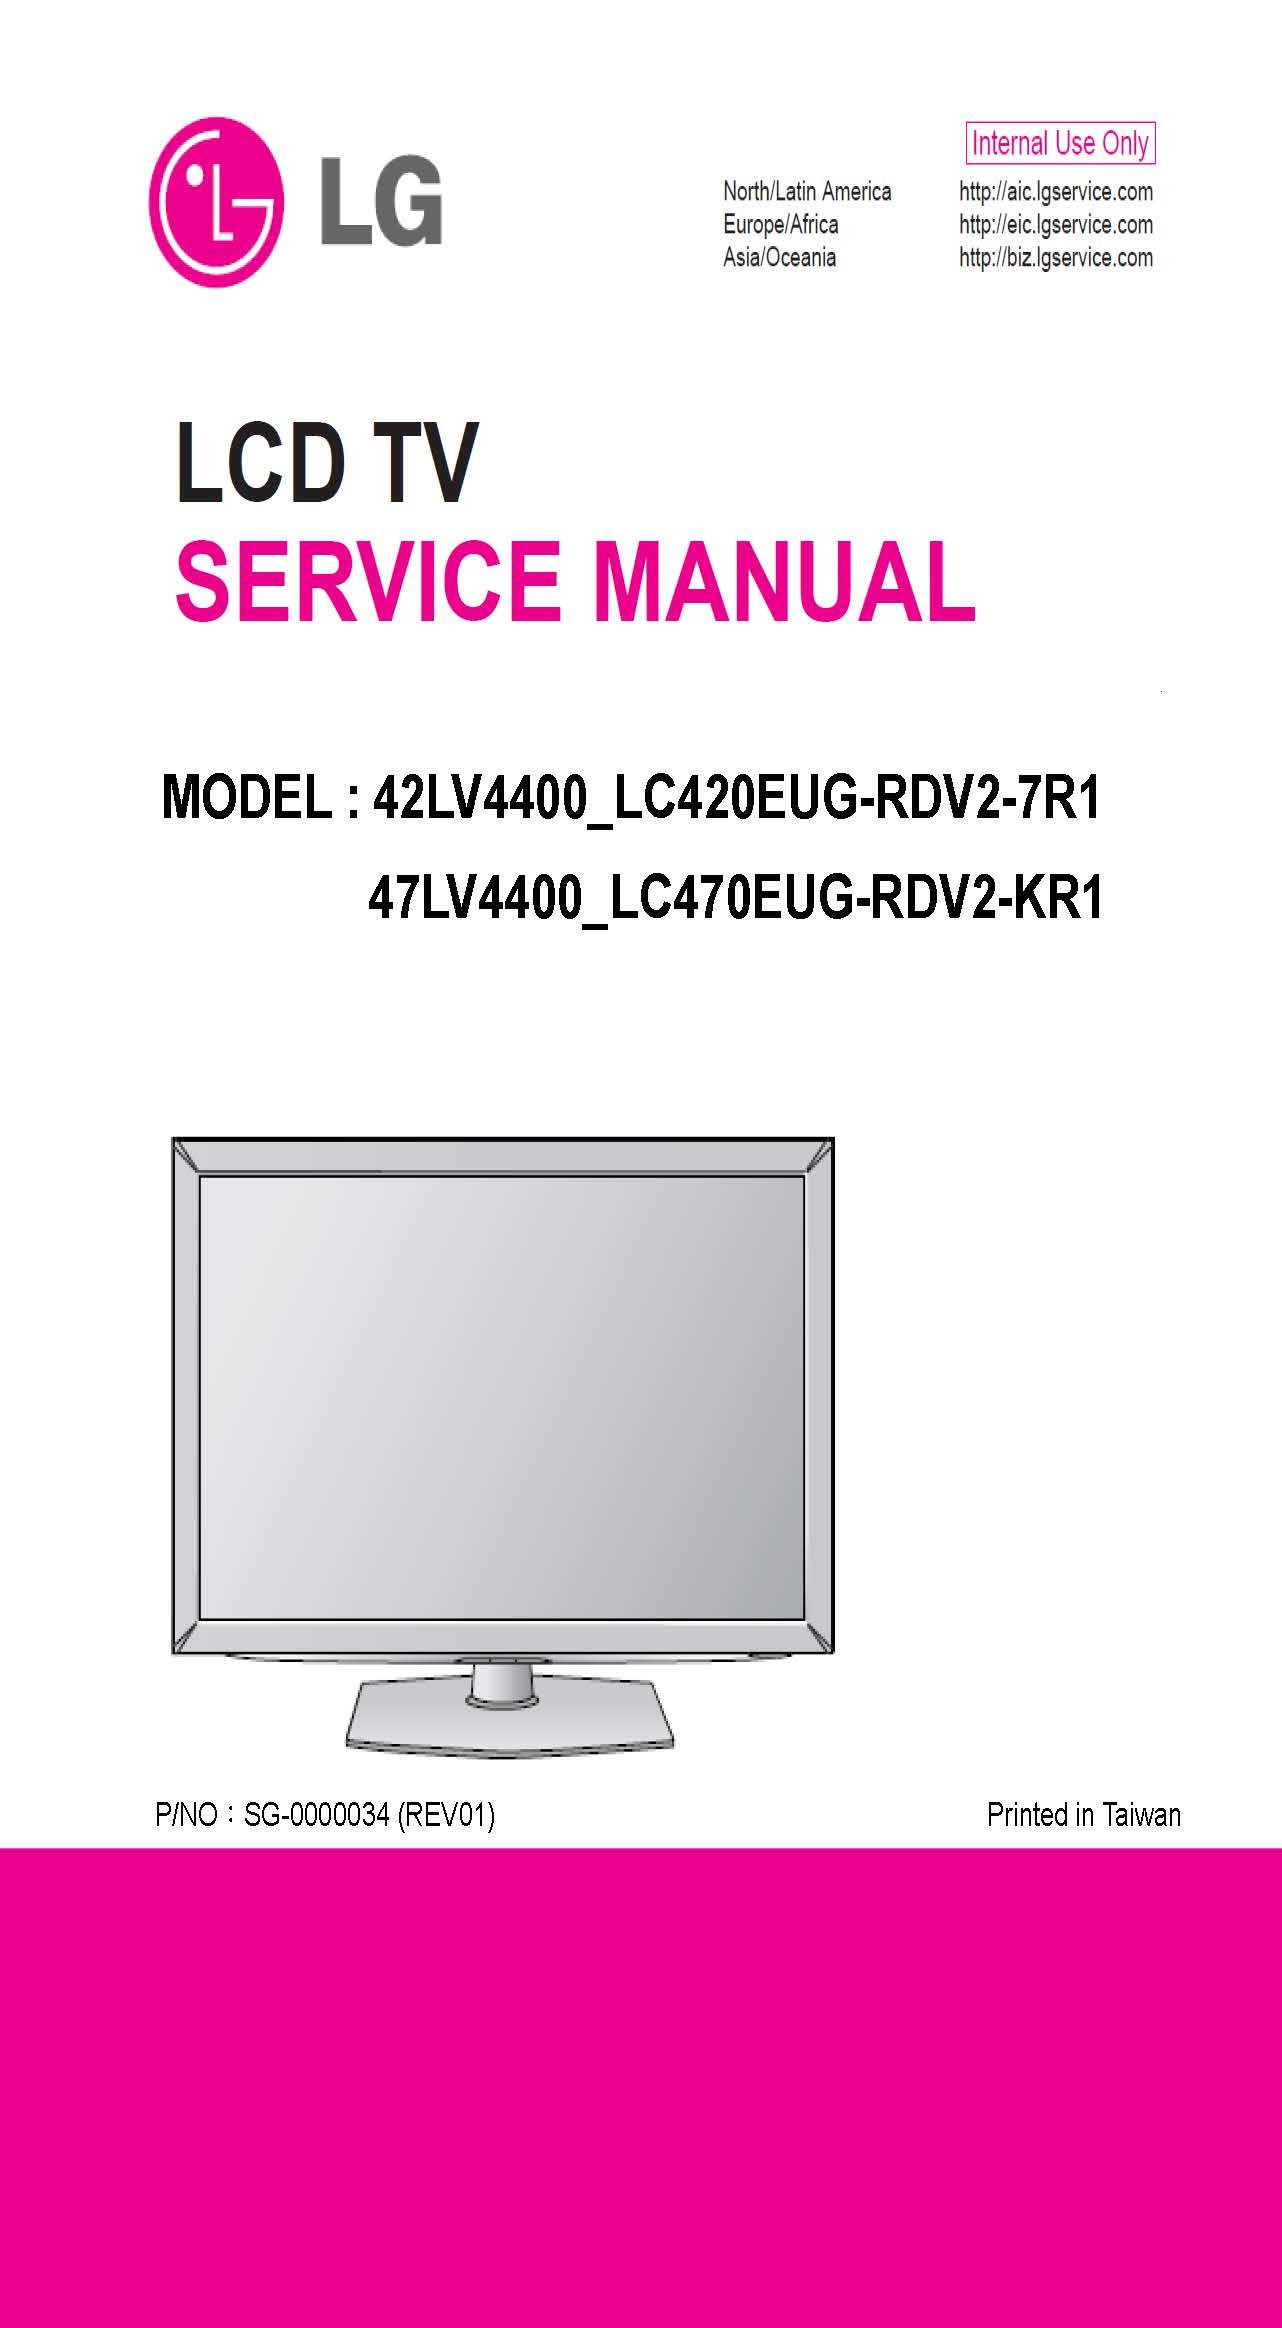 lg 47lv4400 42lv4400 service manual lg amazon com books rh amazon com LG Touch Phone Operating Manual LG Touch Phone Operating Manual